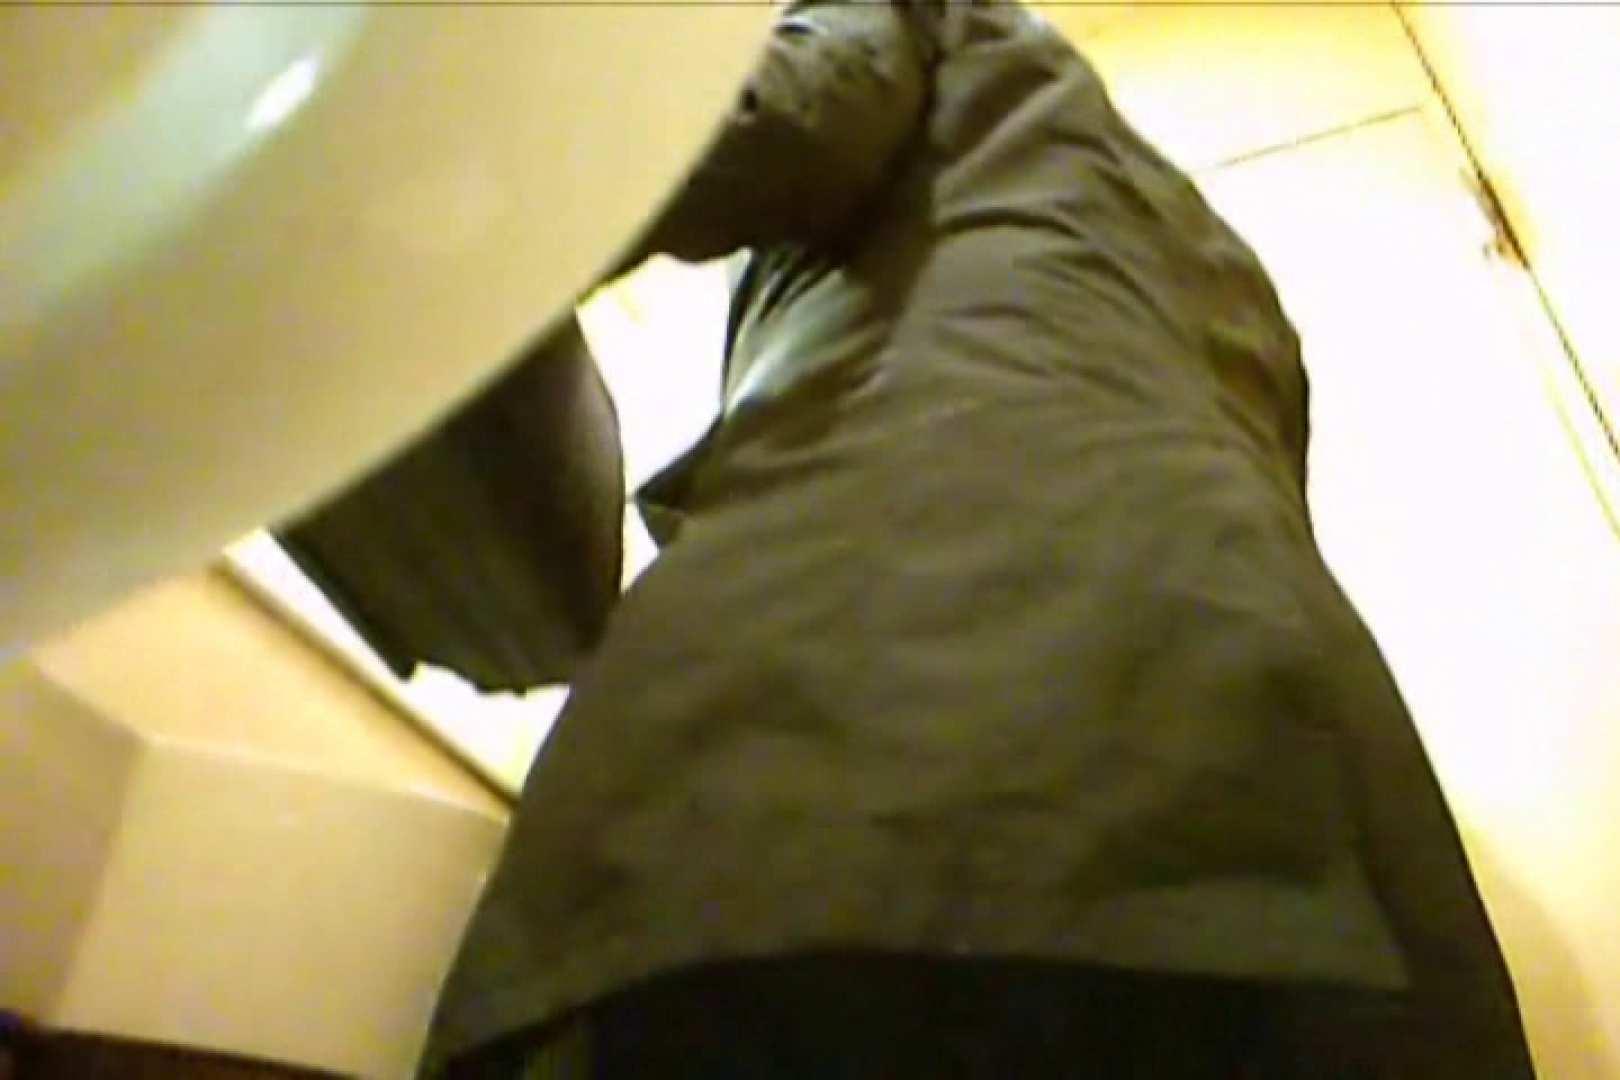 Gボーイ初投稿!掴み取りさんの洗面所覗き!in新幹線!VOL20 リーマン系ボーイズ | ボーイズ覗き  54pic 22